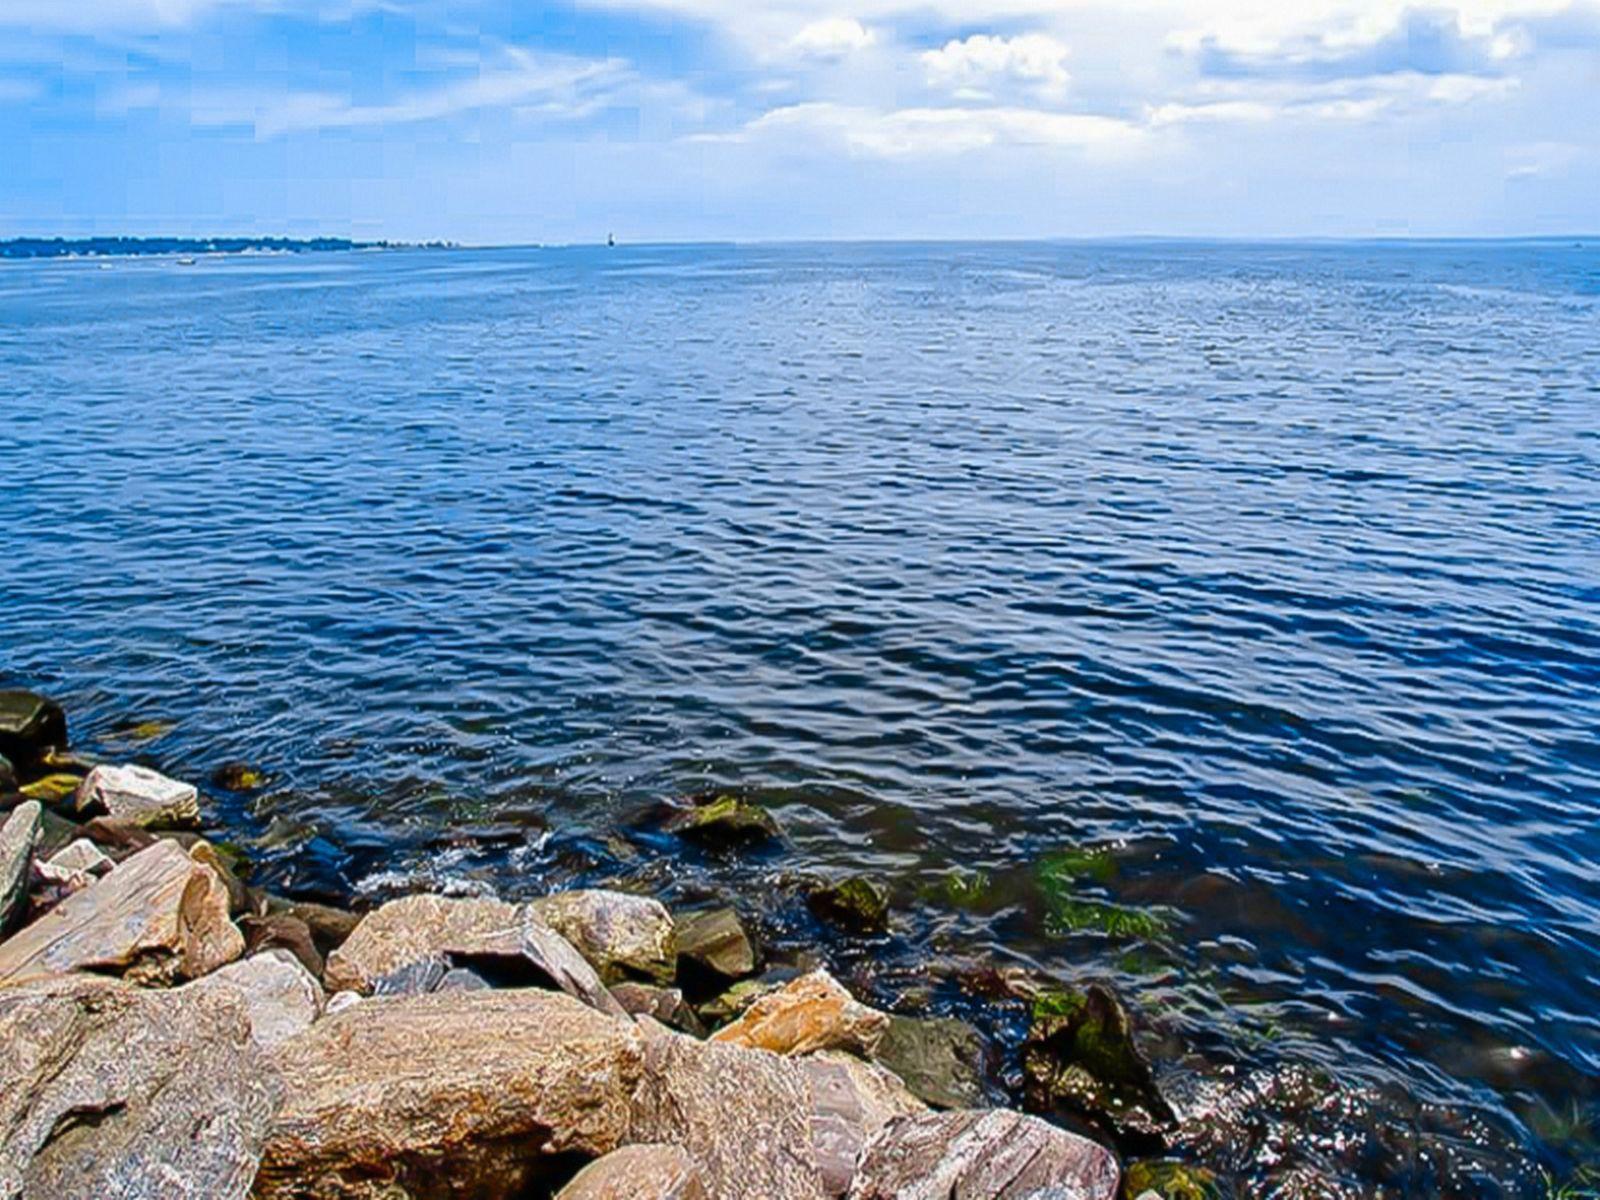 Direct Waterfront at Tip of Peninsula